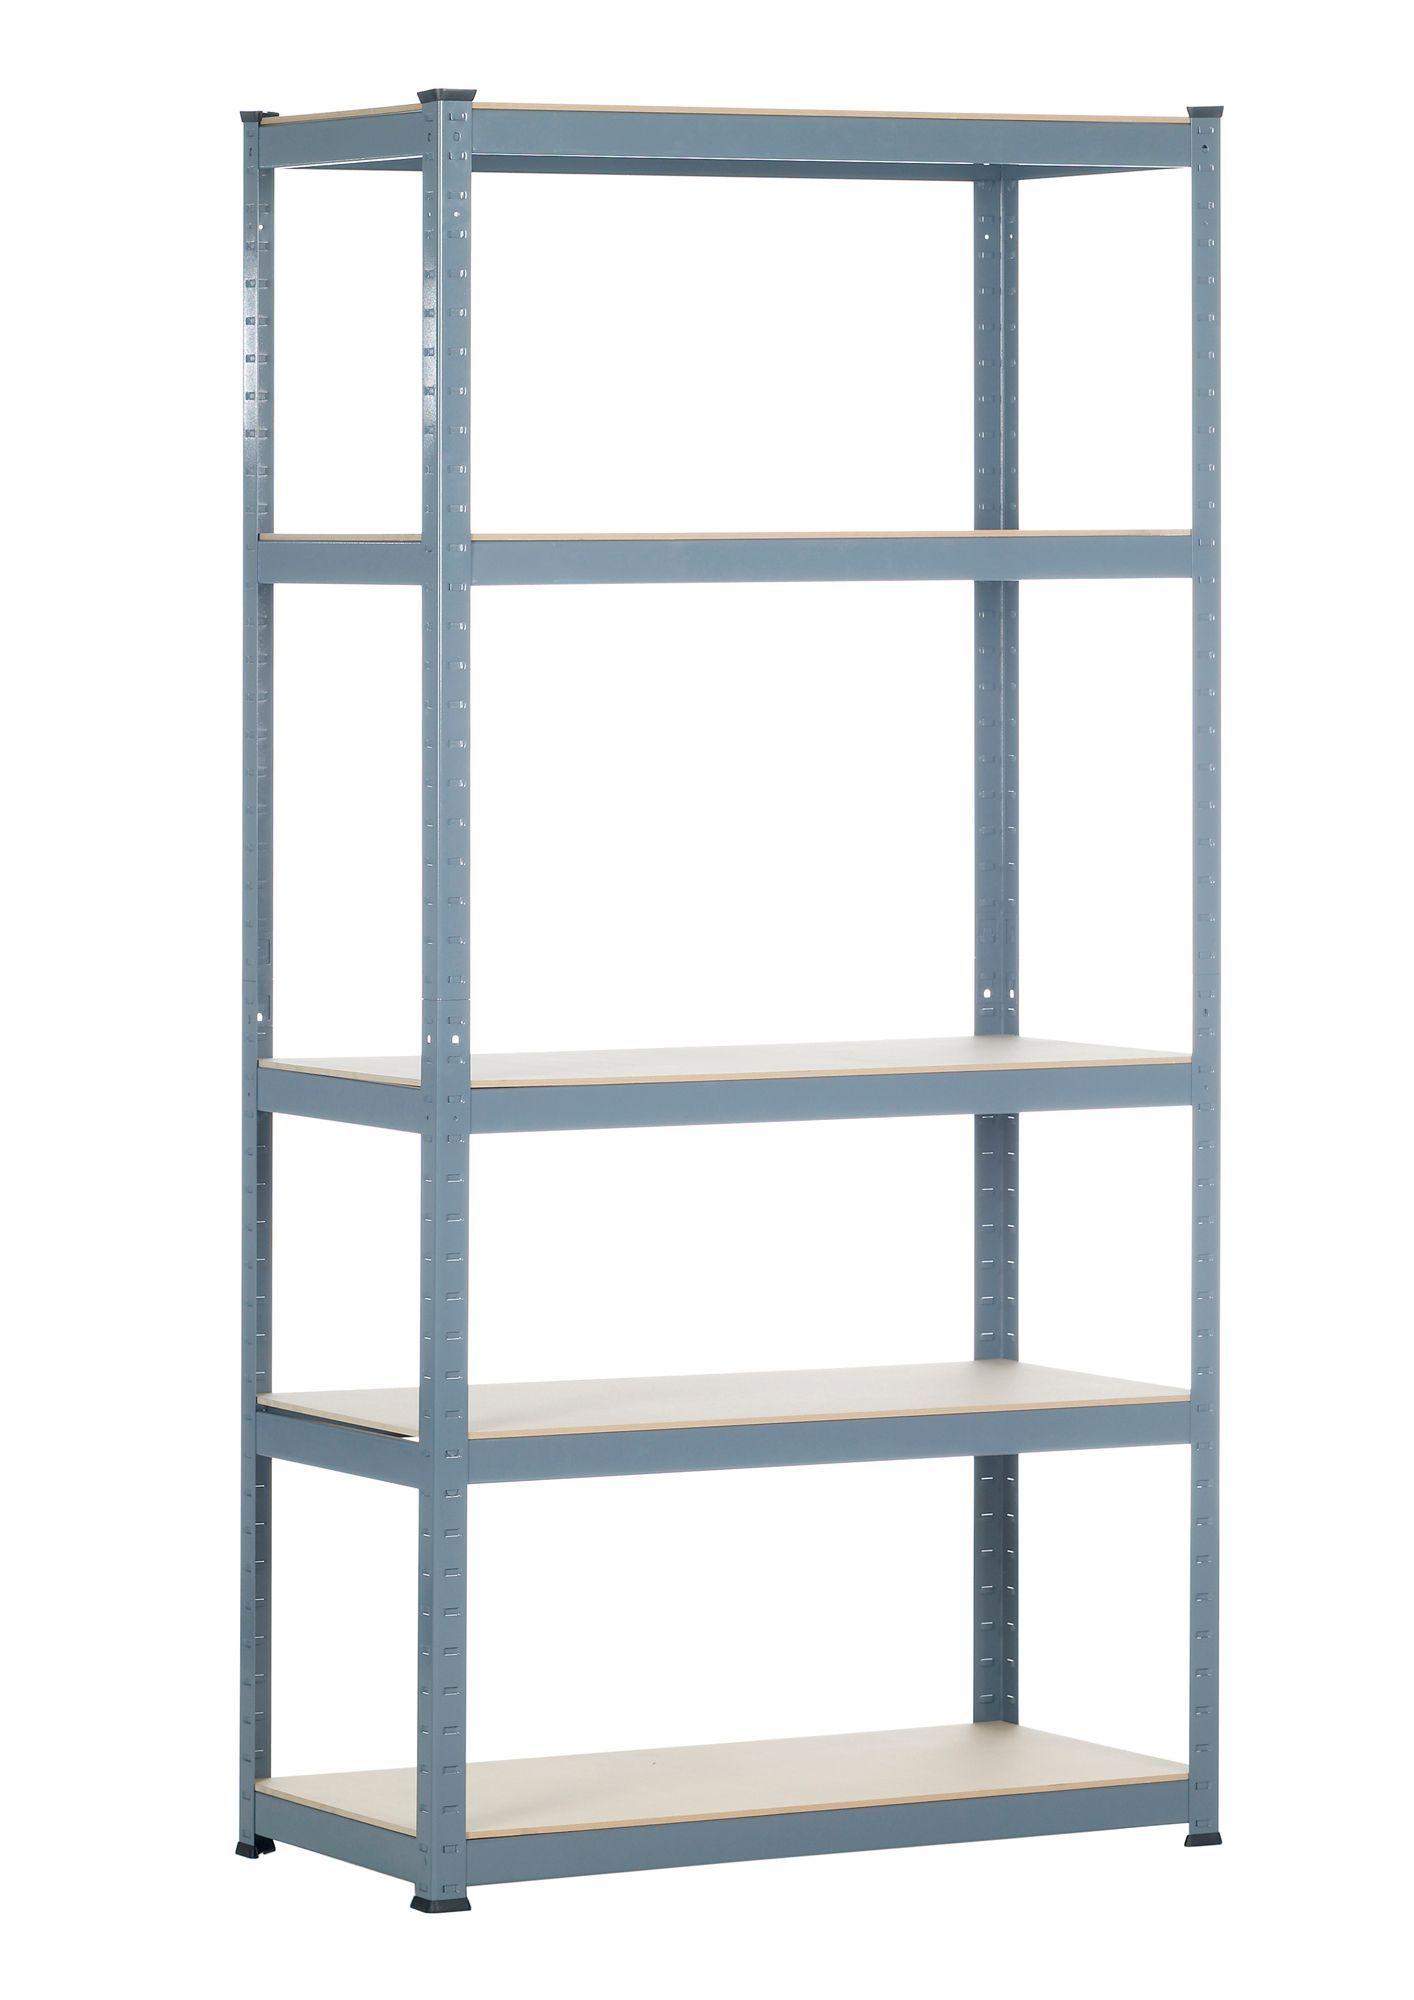 Raxa Power 5 Shelf Chipboard Steel Shelving Unit Rooms Diy At B Q Steel Shelving Unit Steel Shelving Shelves